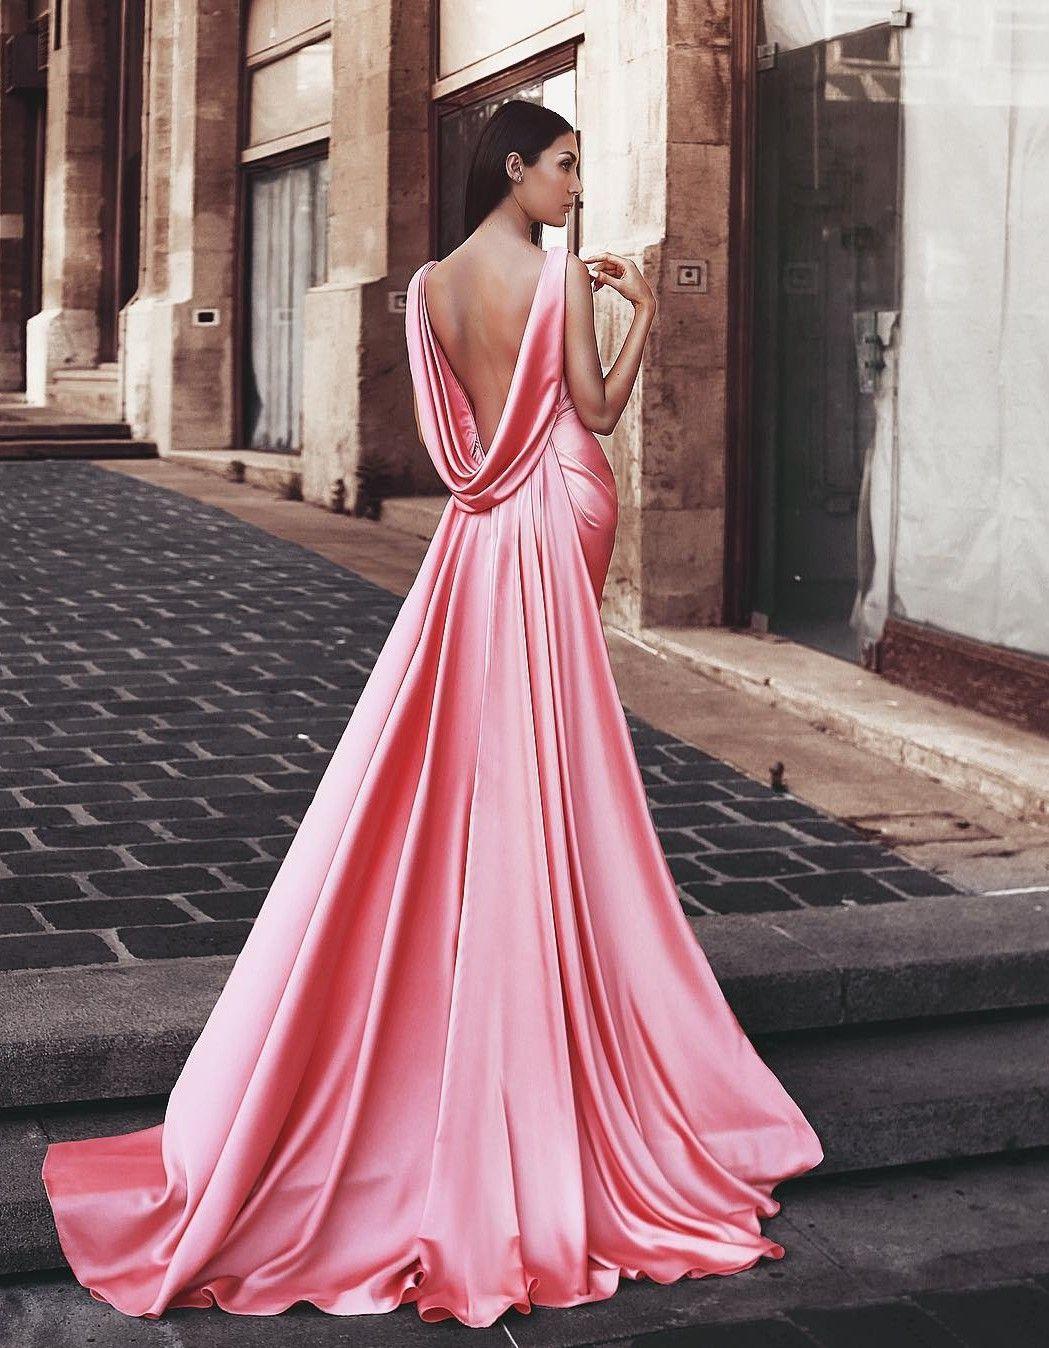 b49e6ab848d361 Rosa Abendkleider Lang Günstig Abendmoden Abiballkleider  Online_Brautkleider,Abiballkleider,Abendkleider